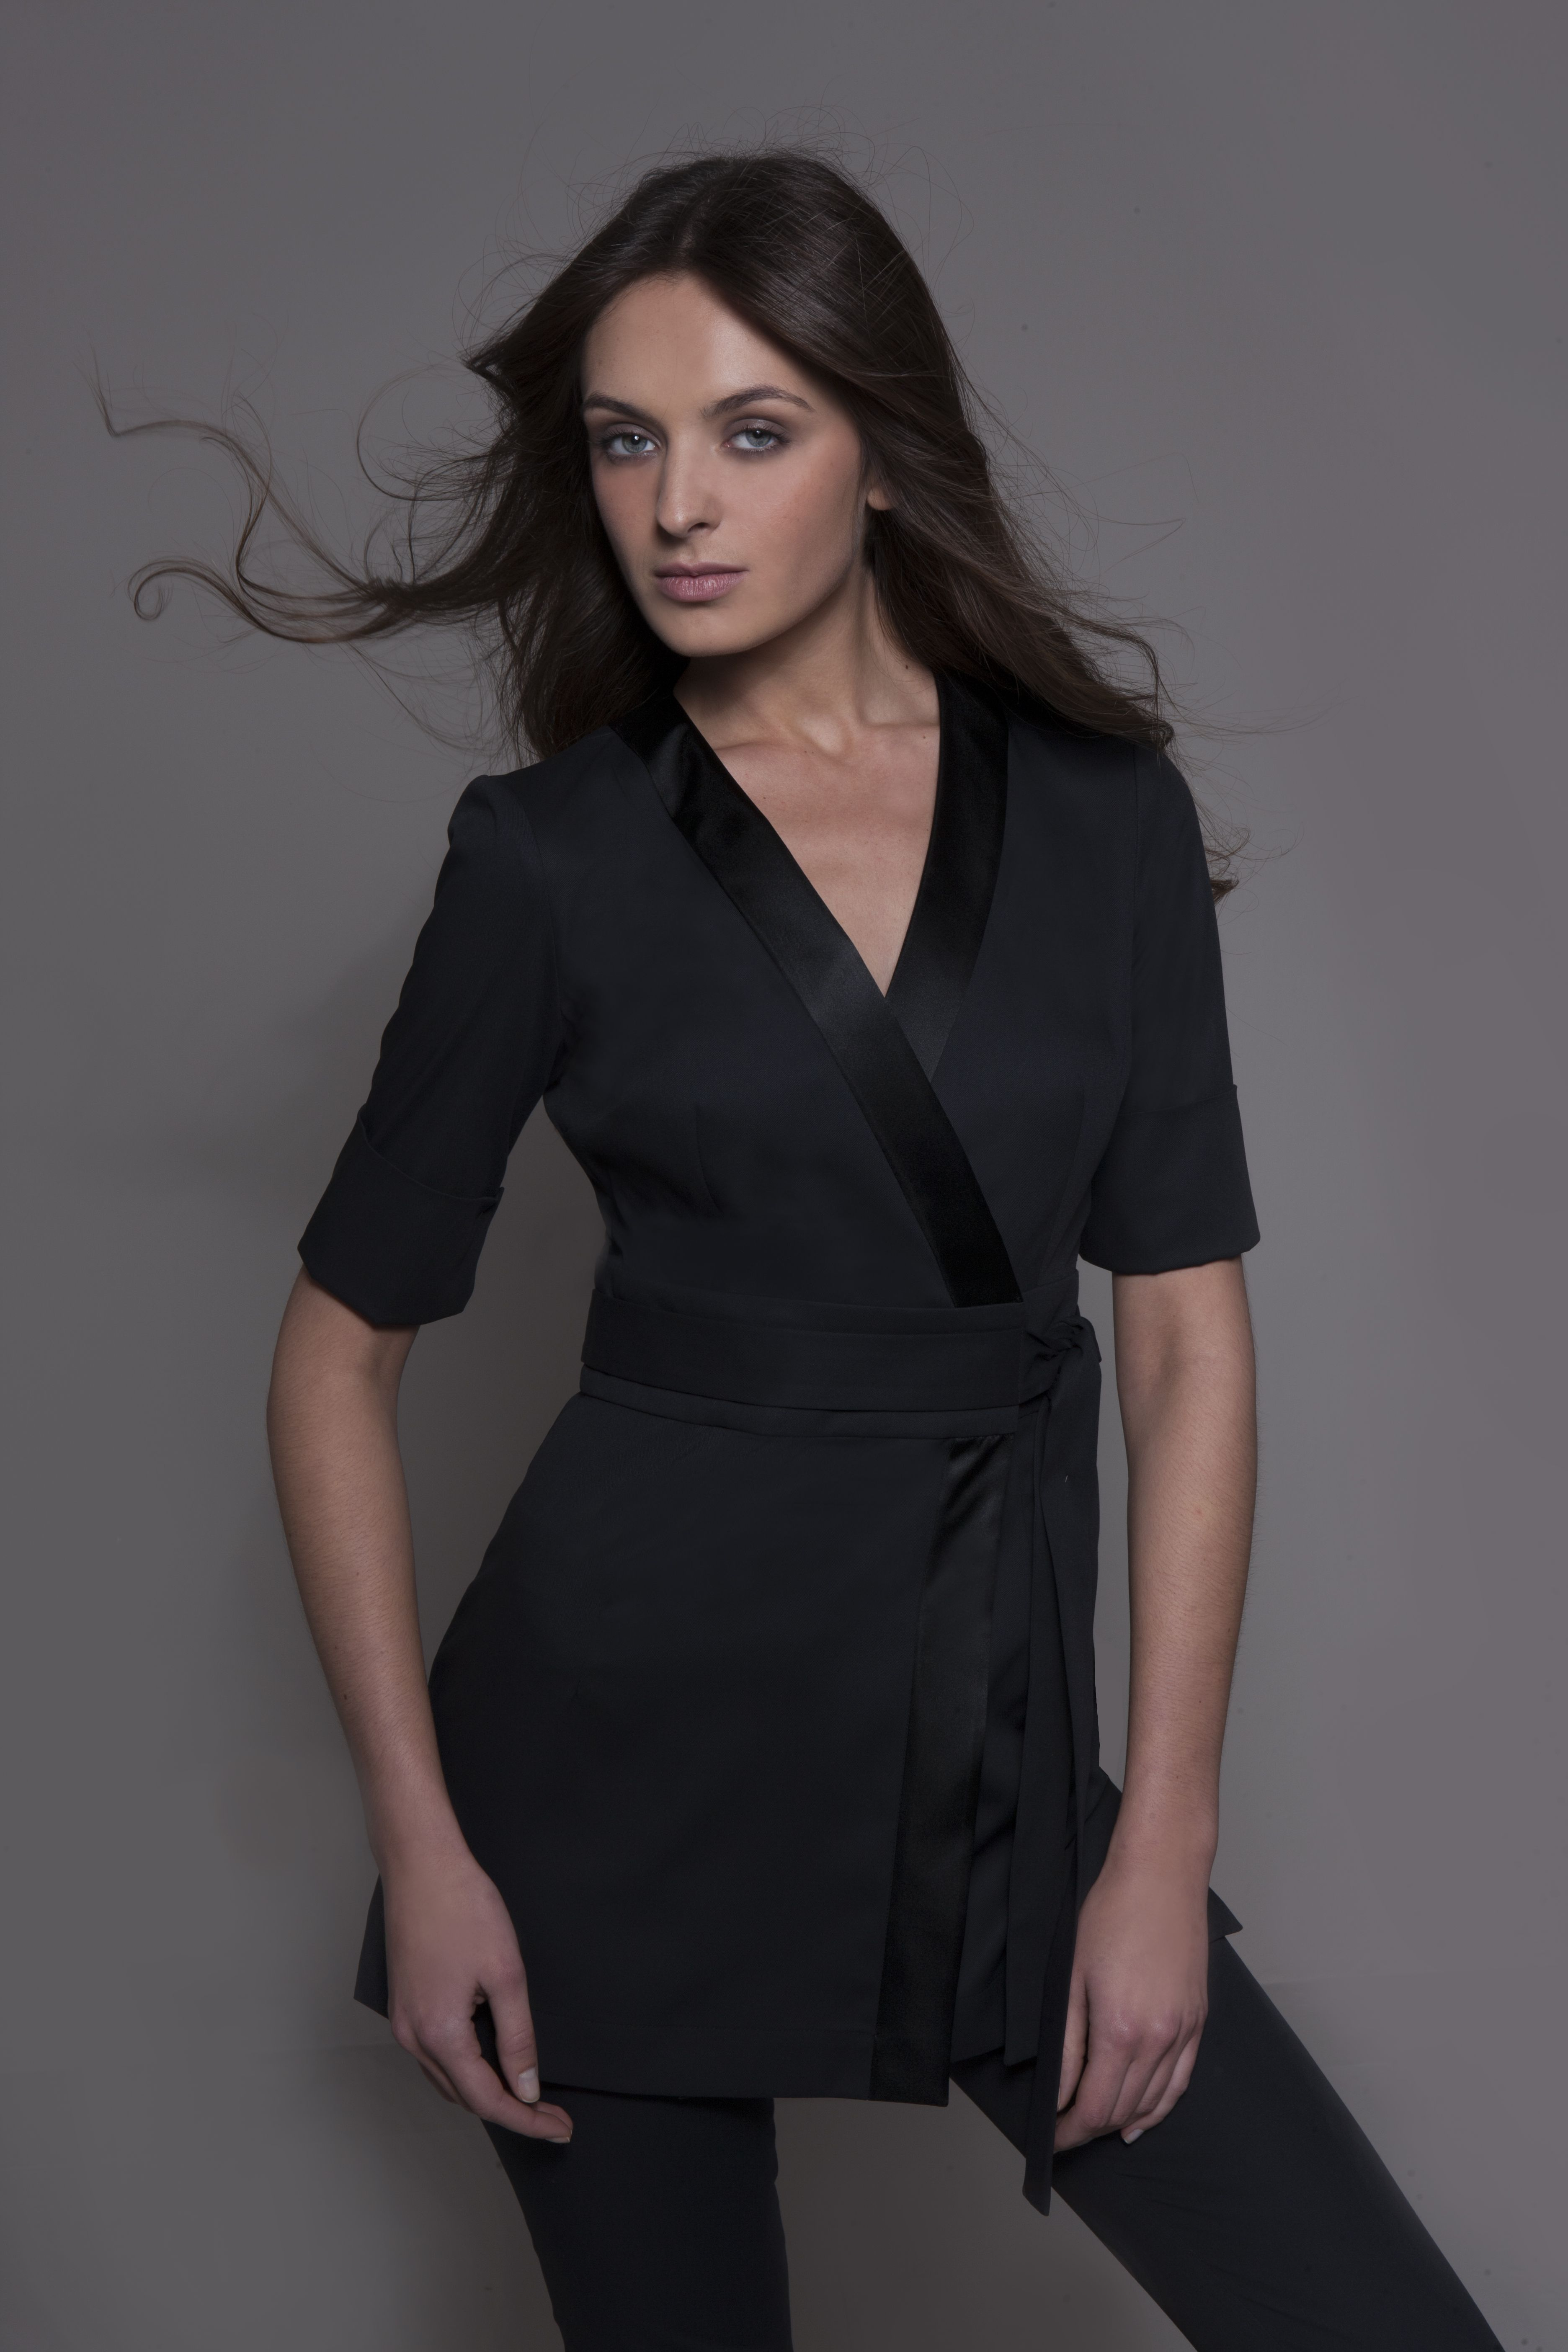 Spa uniform nagoya in black elegant spa tunic for Spa nagoya uniform